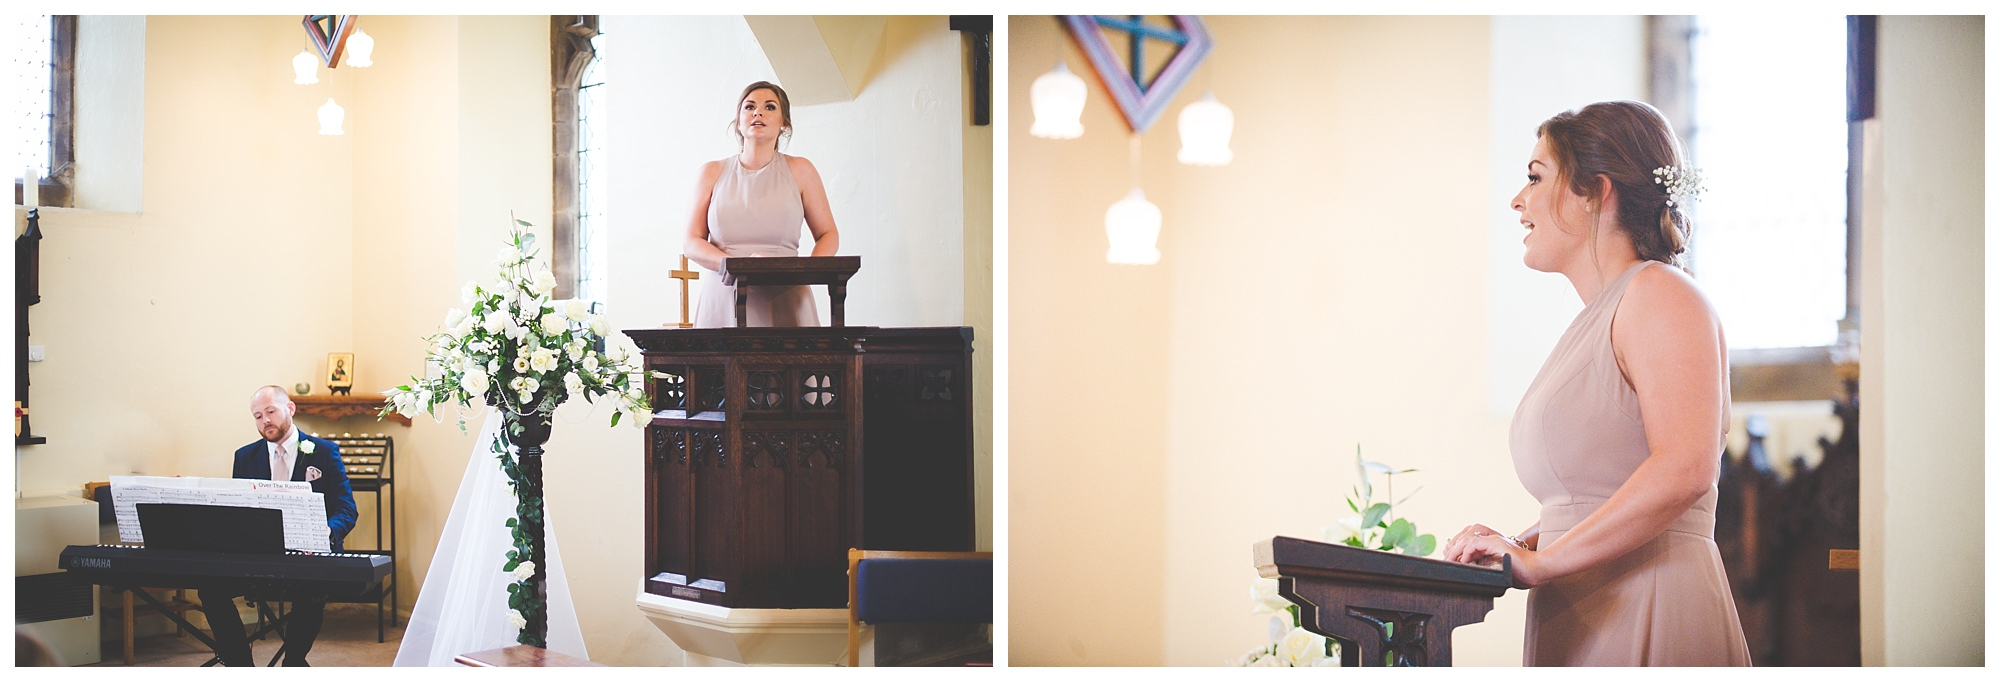 Bagden-Hall-Wedding-Photography_0027